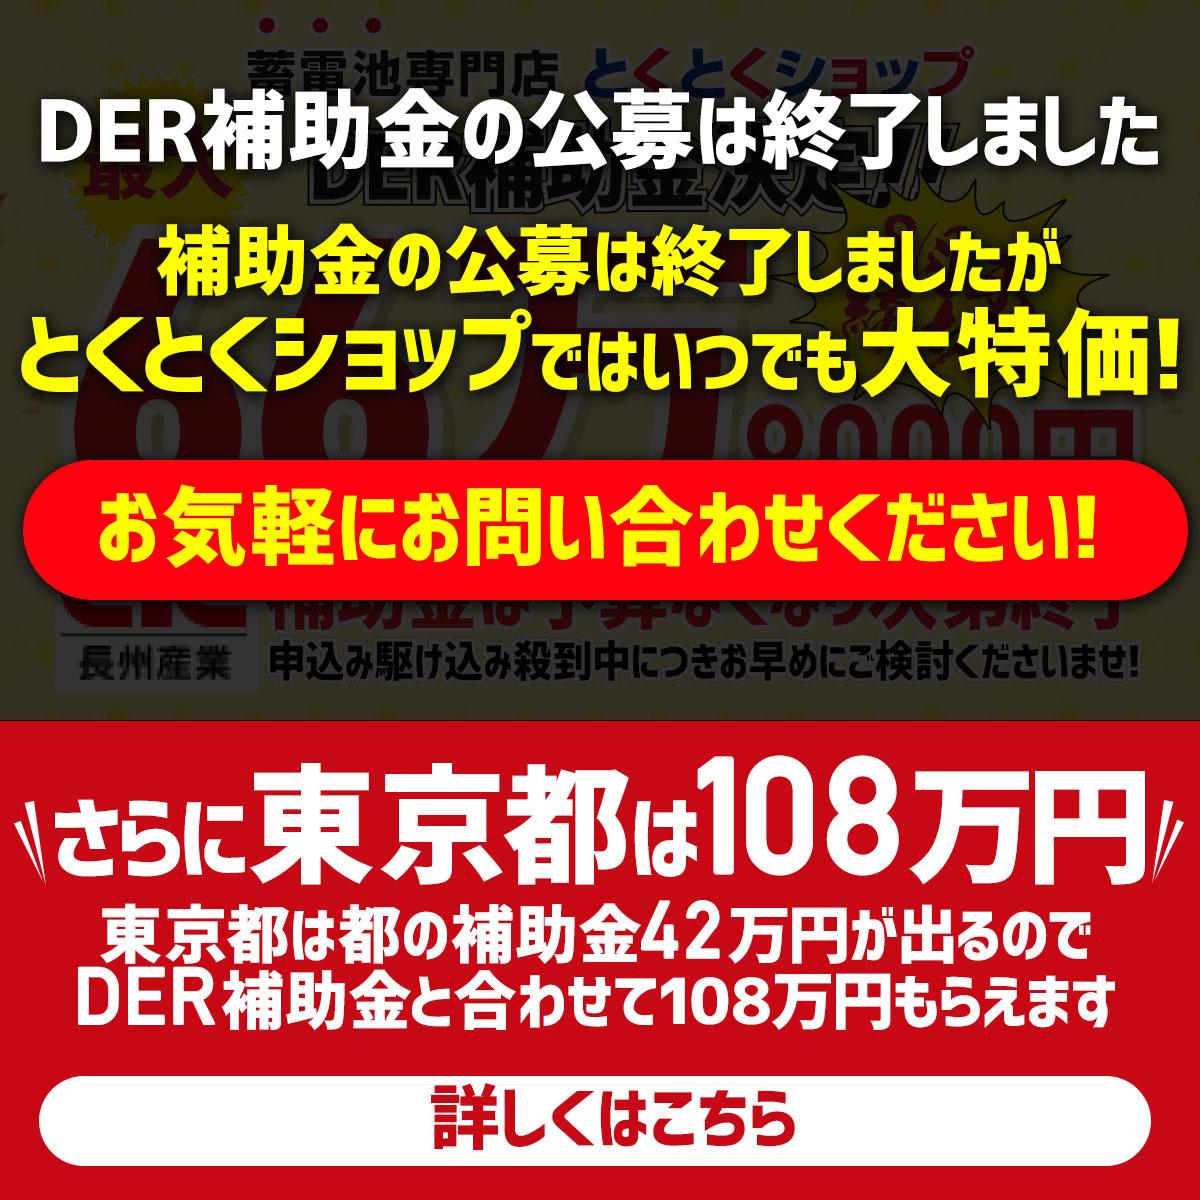 DER補助金決定!最大668,000円もらえます!